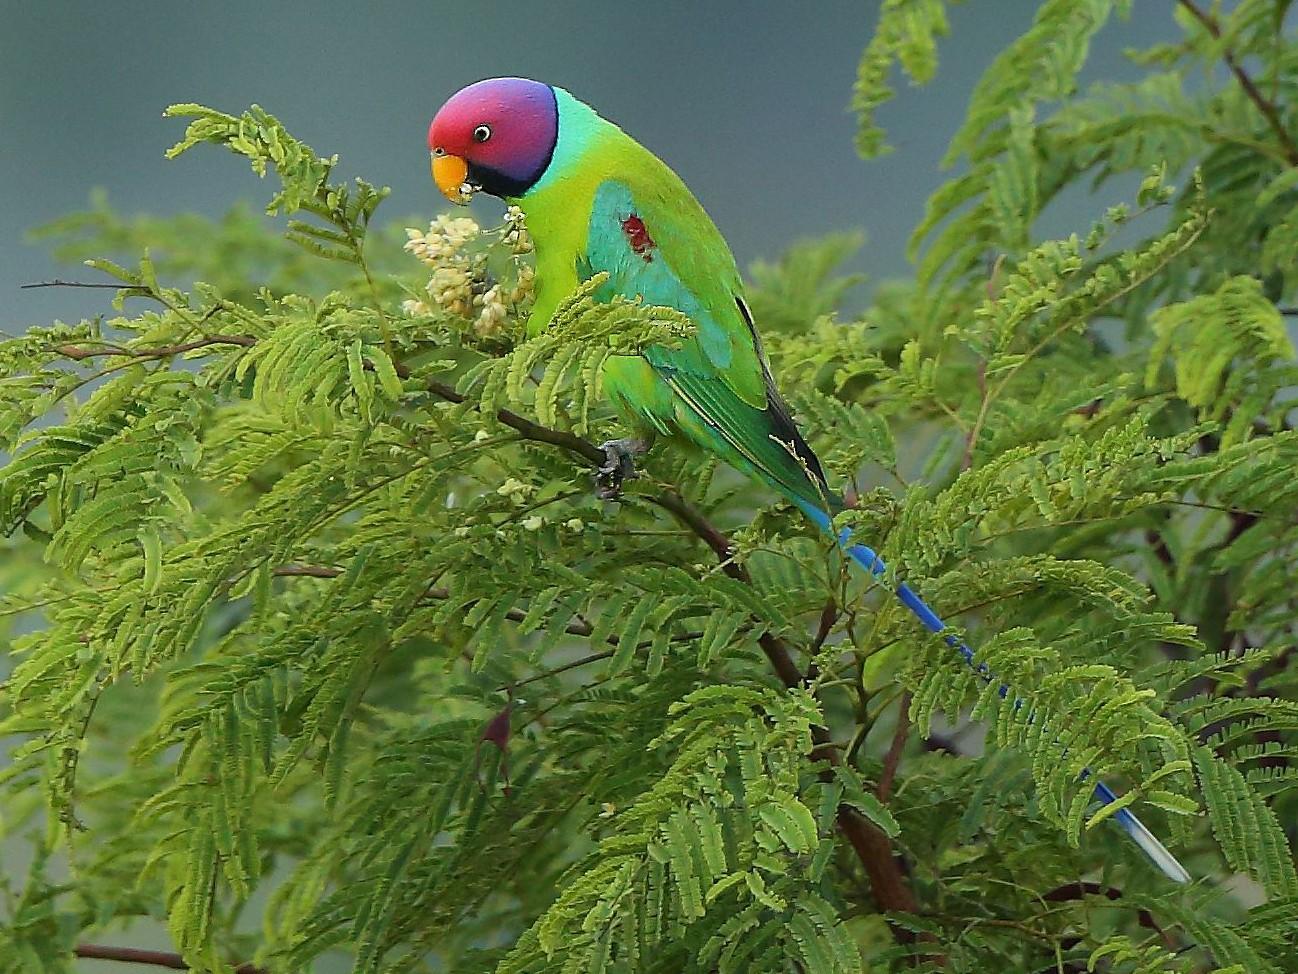 Plum-headed Parakeet - Albin Jacob